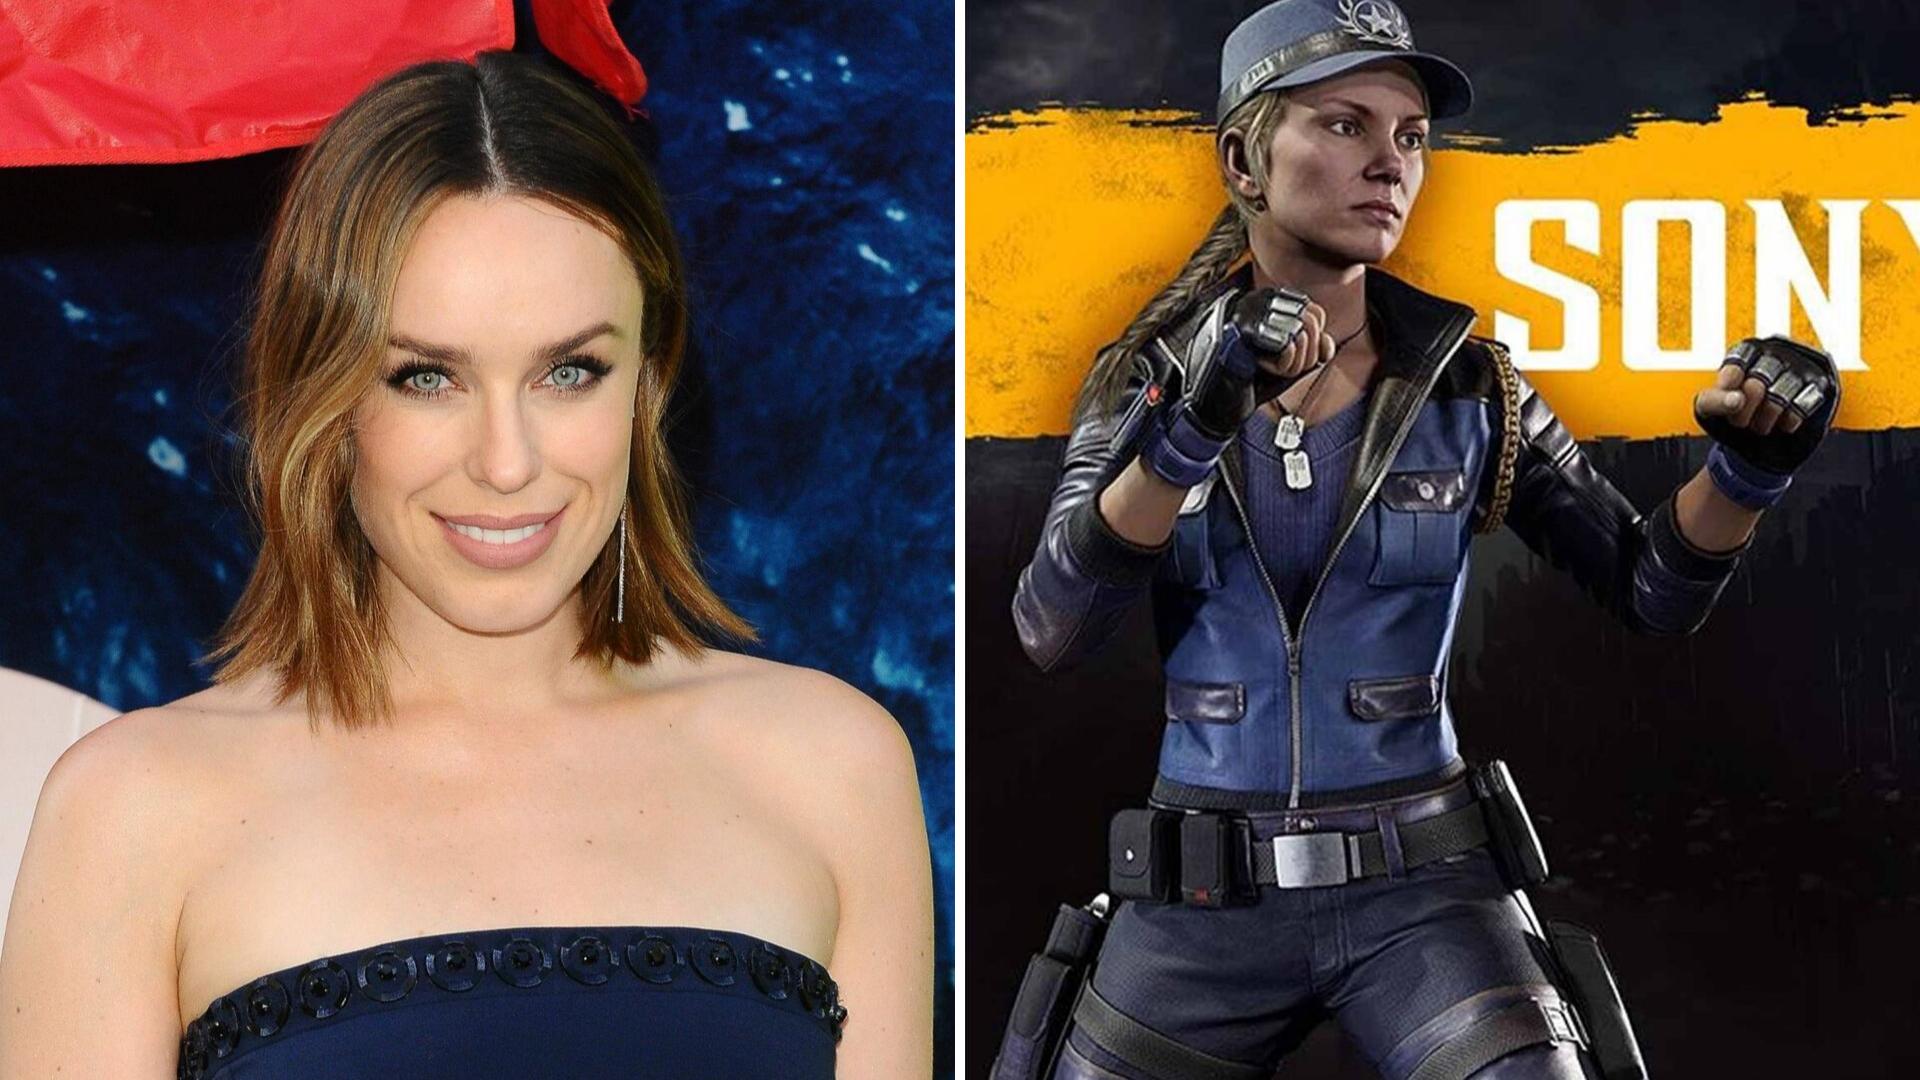 Jessica McNamee Sonya Blade Mortal Kombat -elokuva